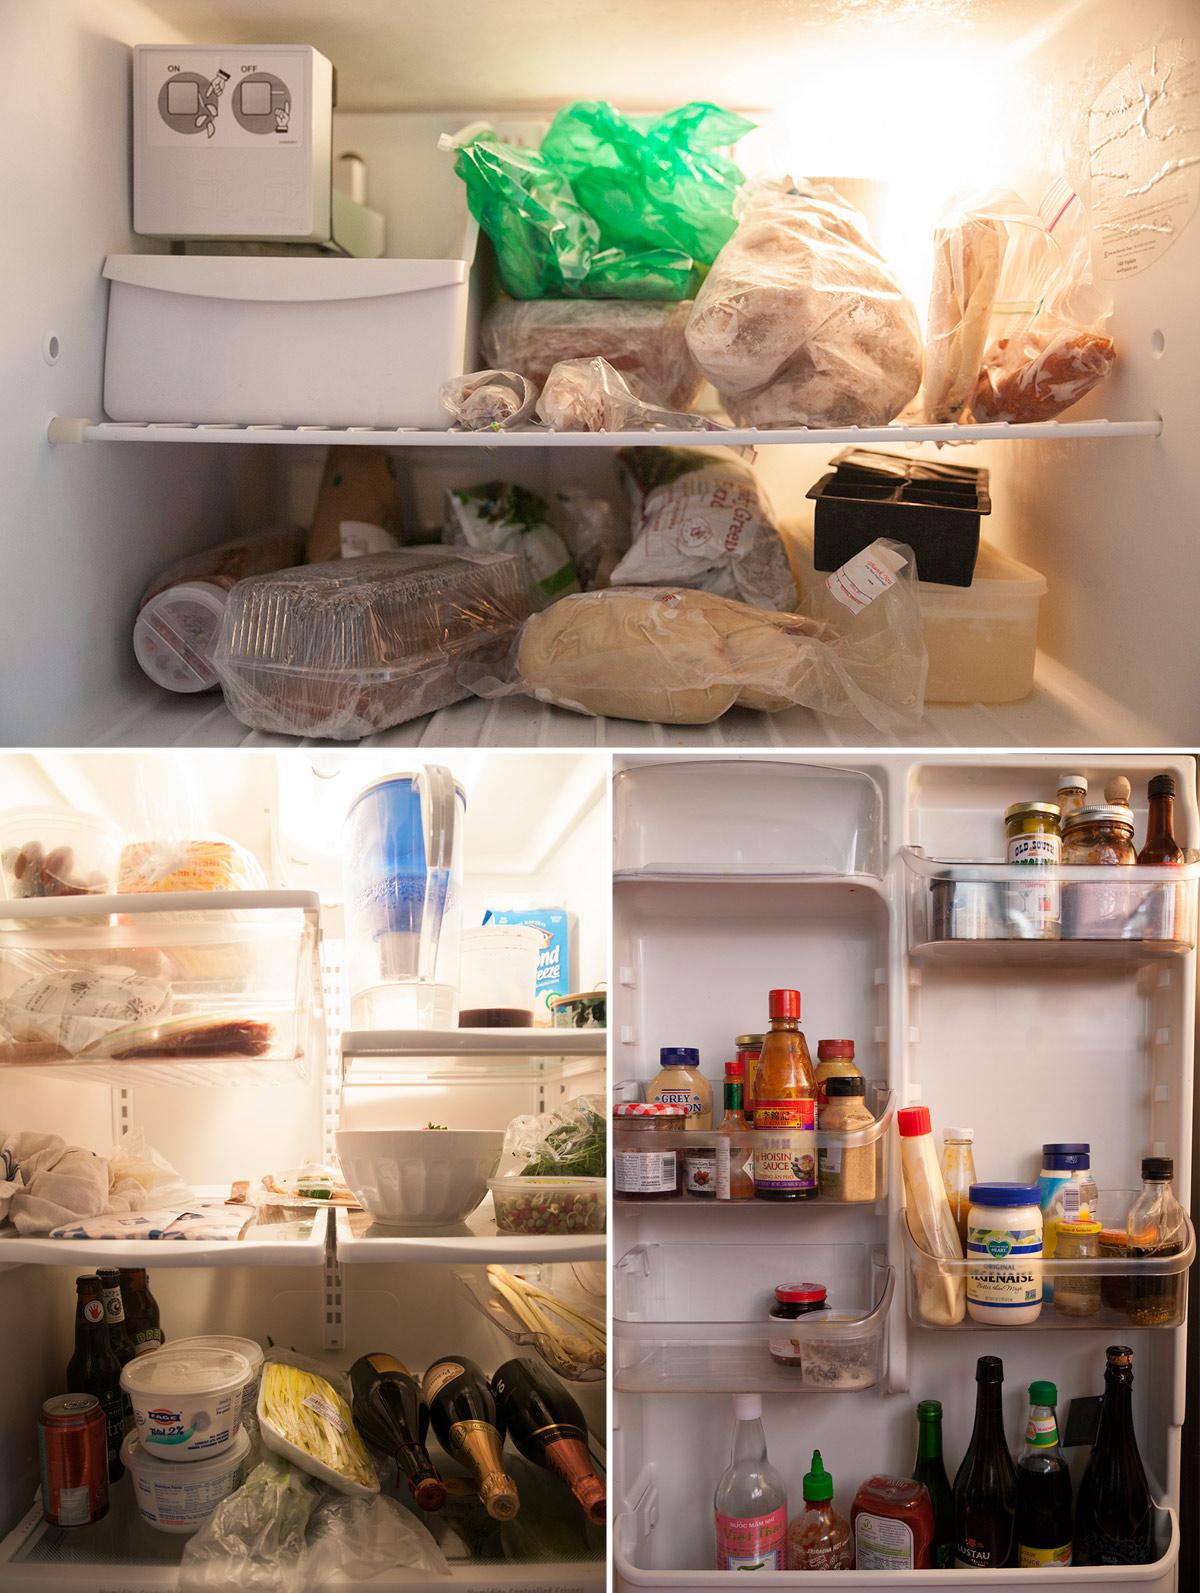 fridge-final